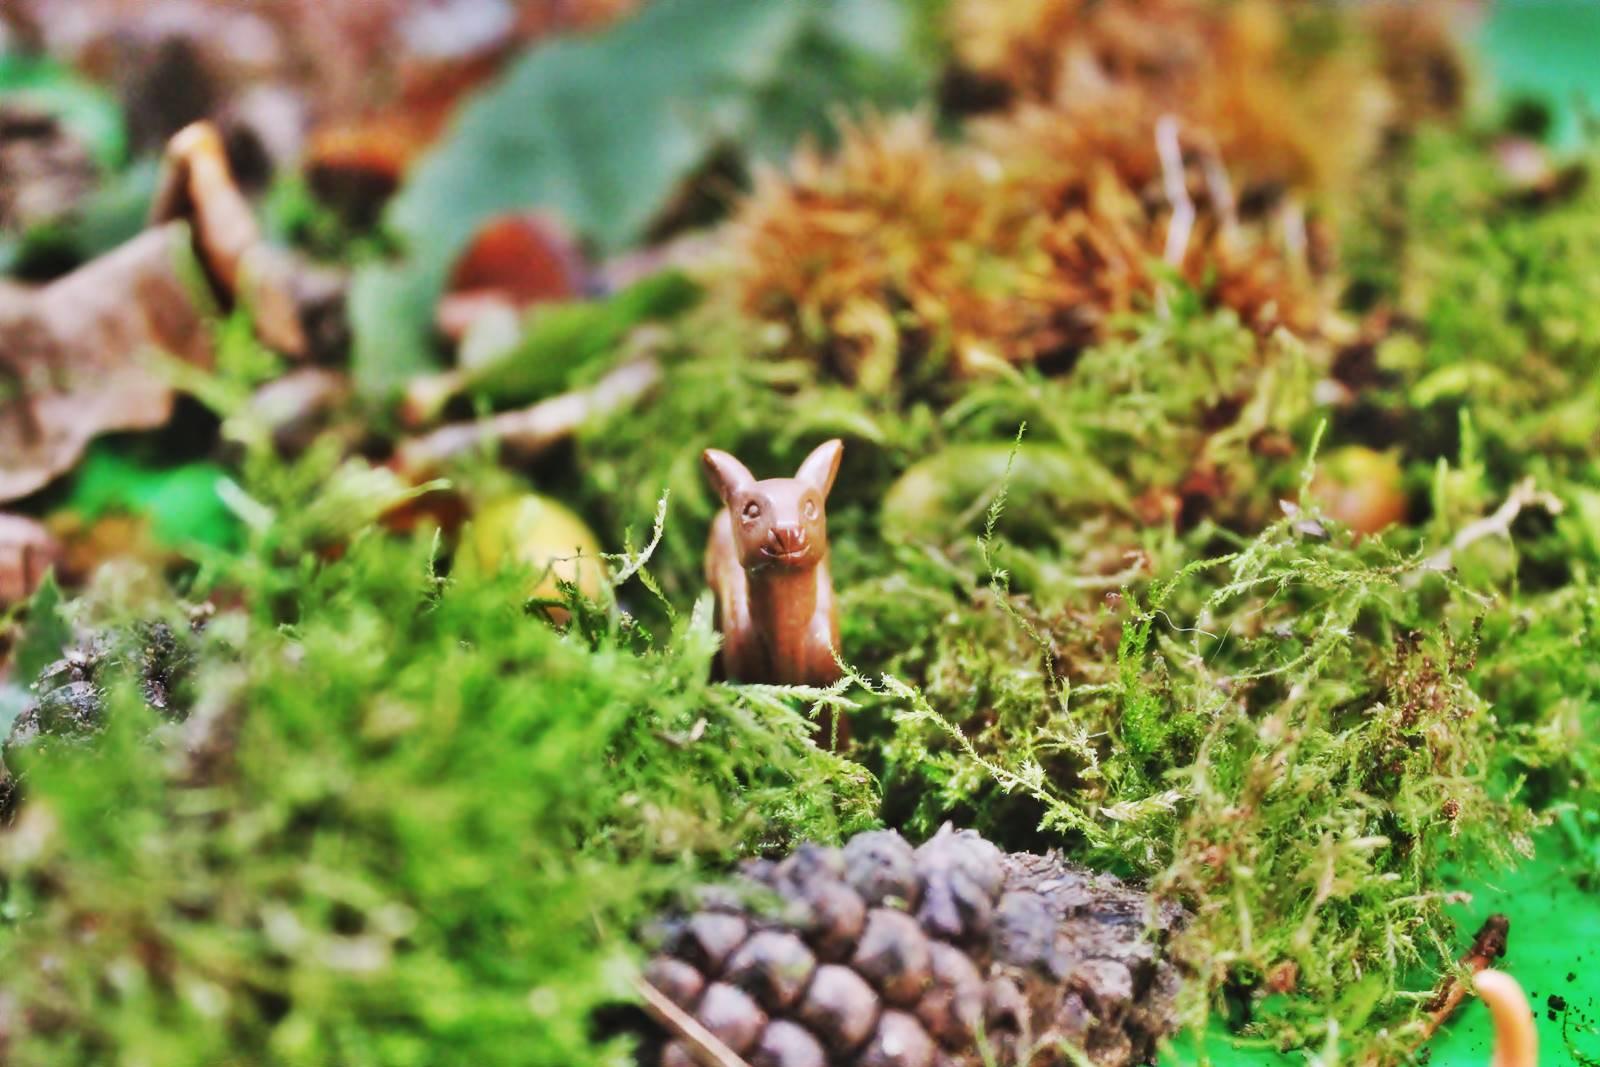 Table des saisons steiner waldorf ief homescooling ecole maison automne